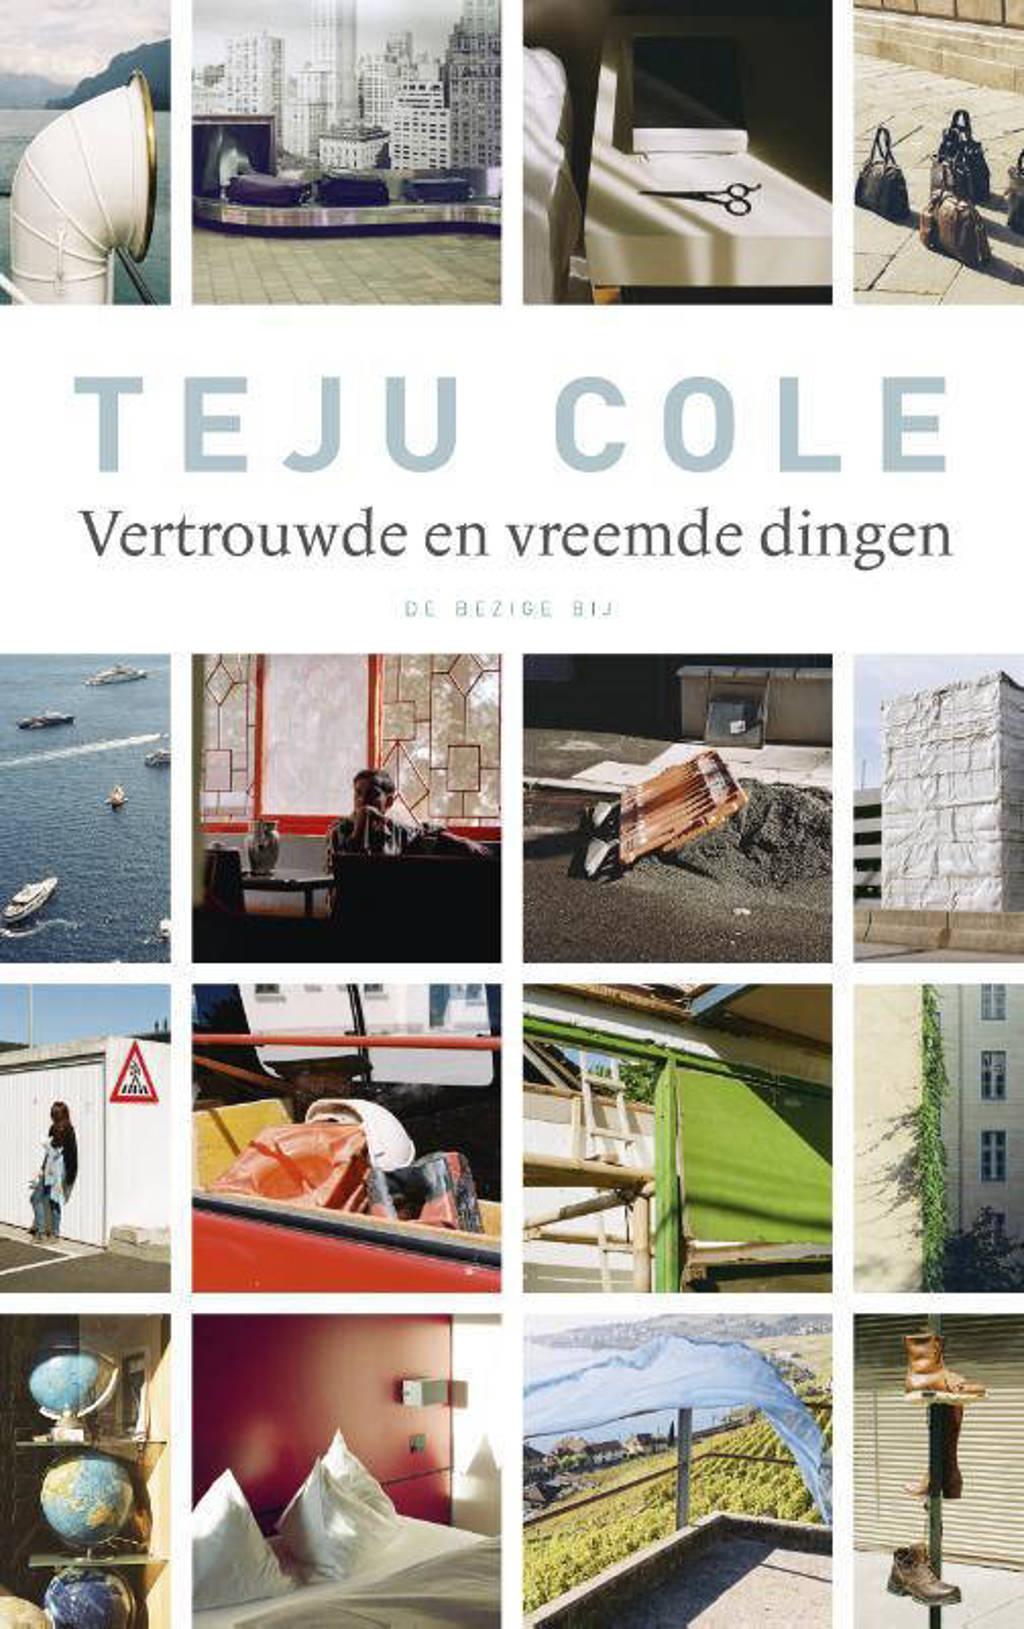 Vertrouwde en vreemde dingen - Teju Cole